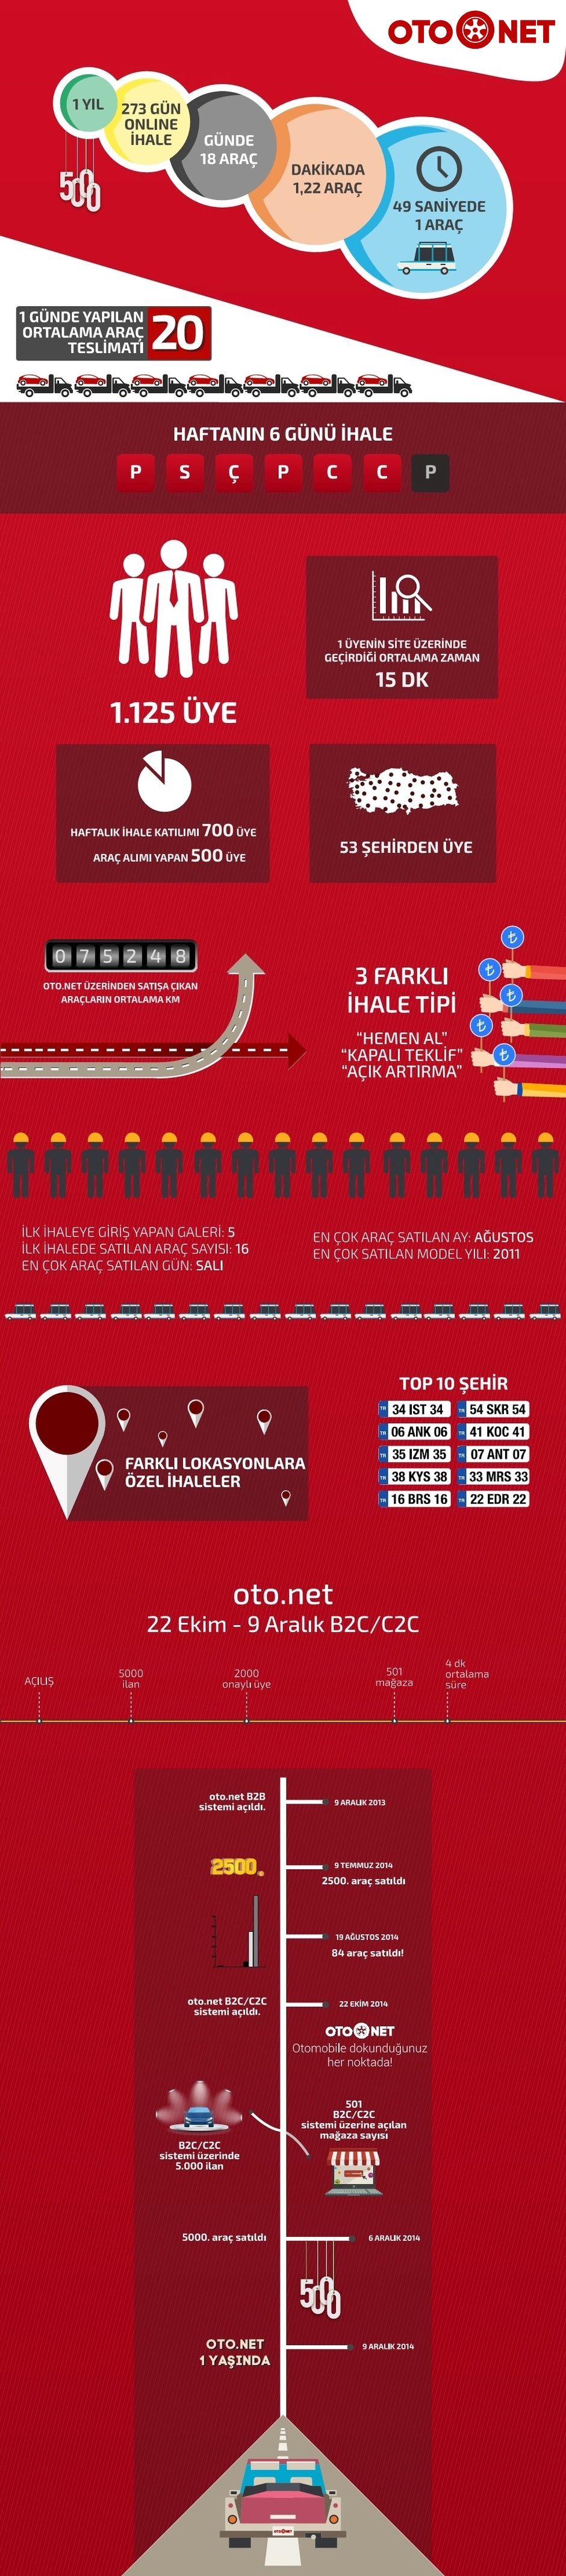 oto.net-otomobil-ilan.infografik